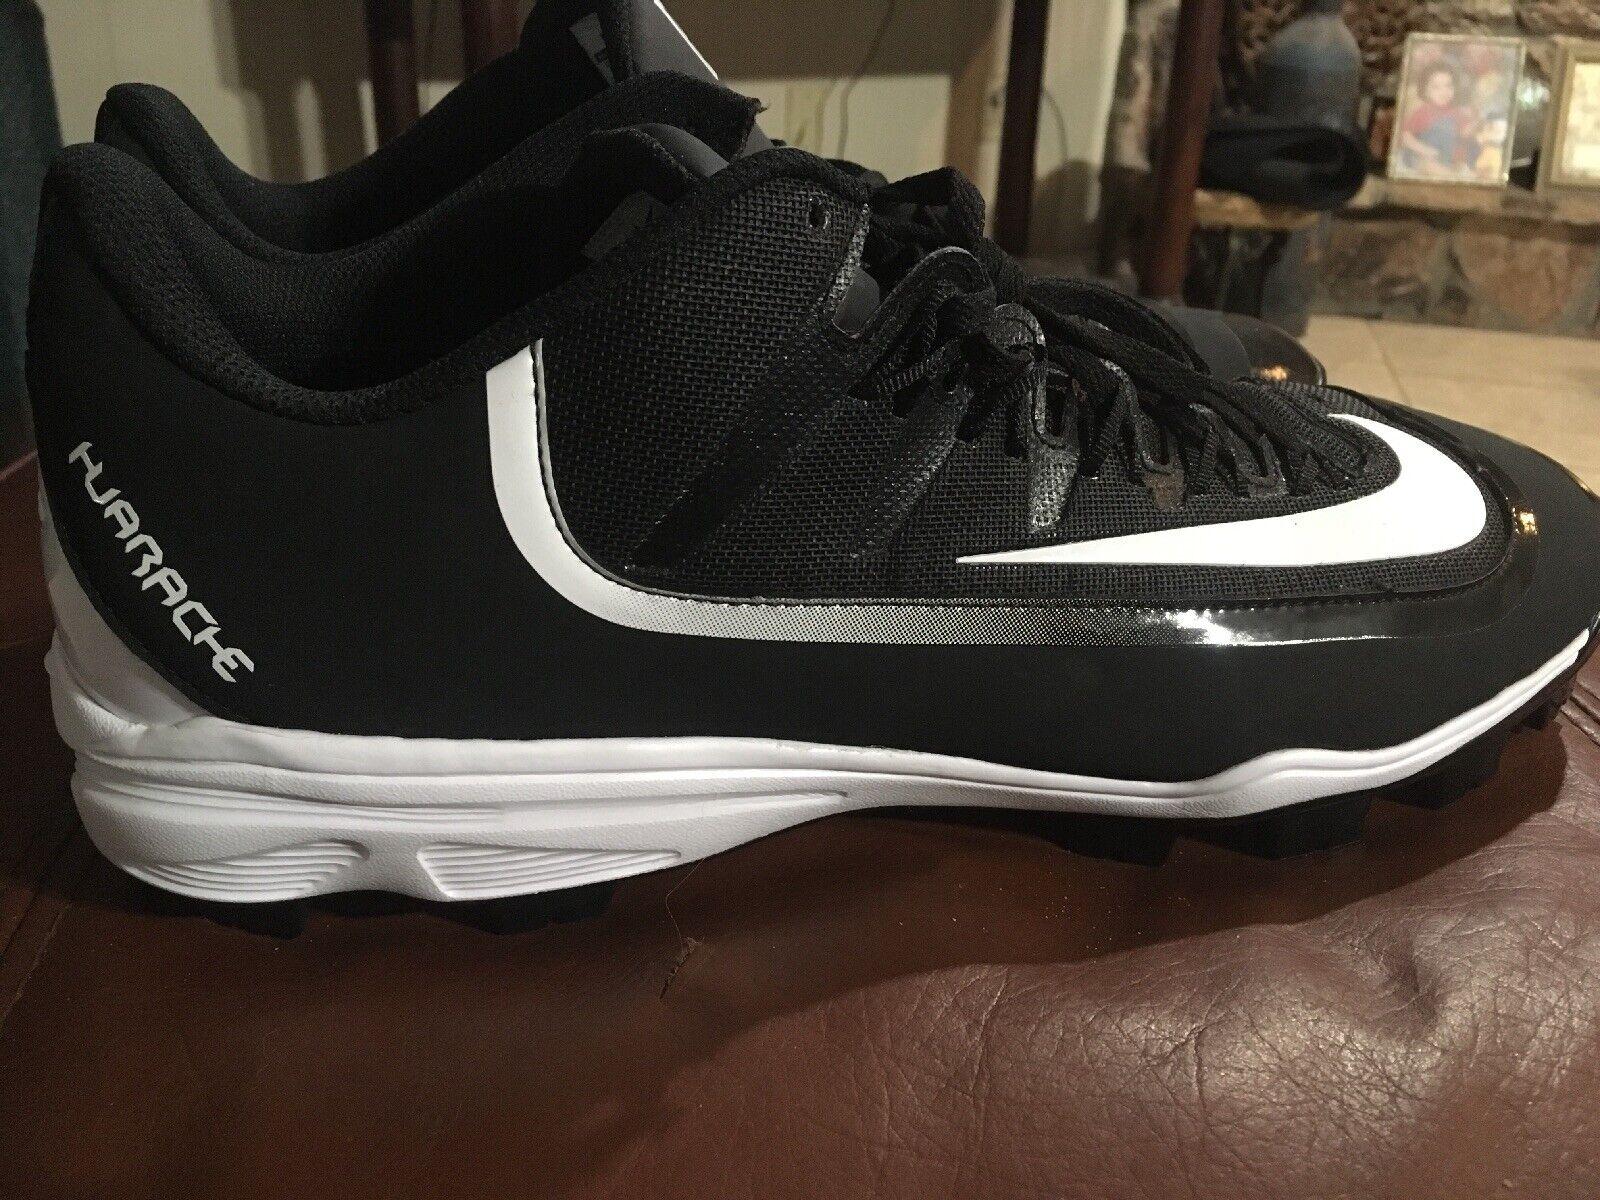 New Men's Huarache 2K 2K 2K Filth Pro Low Baseball Molded Cleats Talla 14 negro blancoo 27a3e5